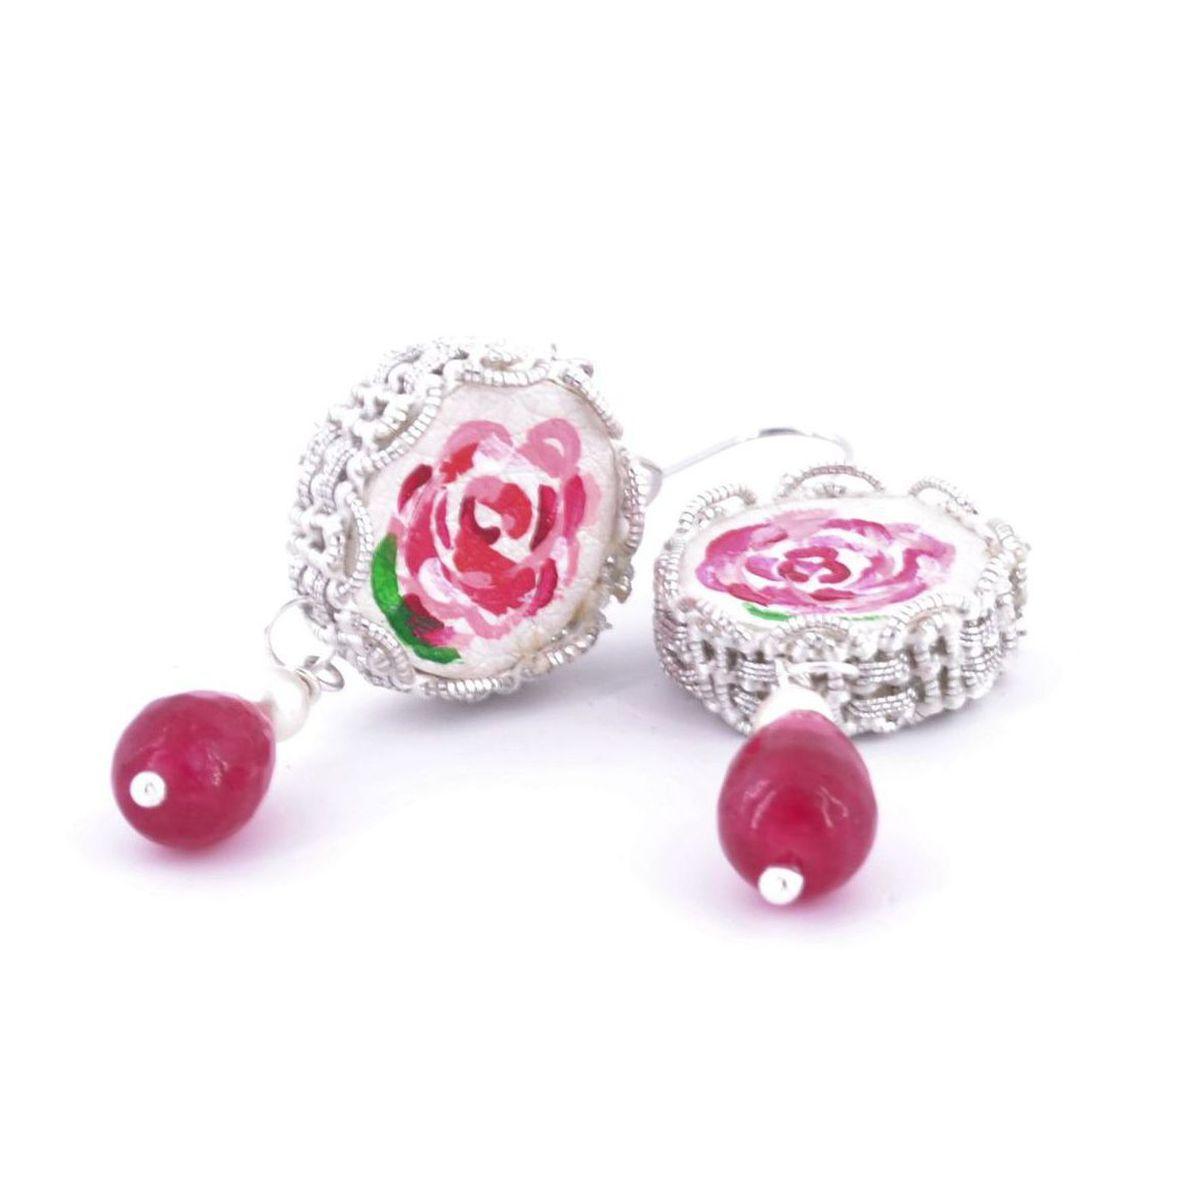 Tambourine Rose Mamma Earrings Red Tataratà Bijoux